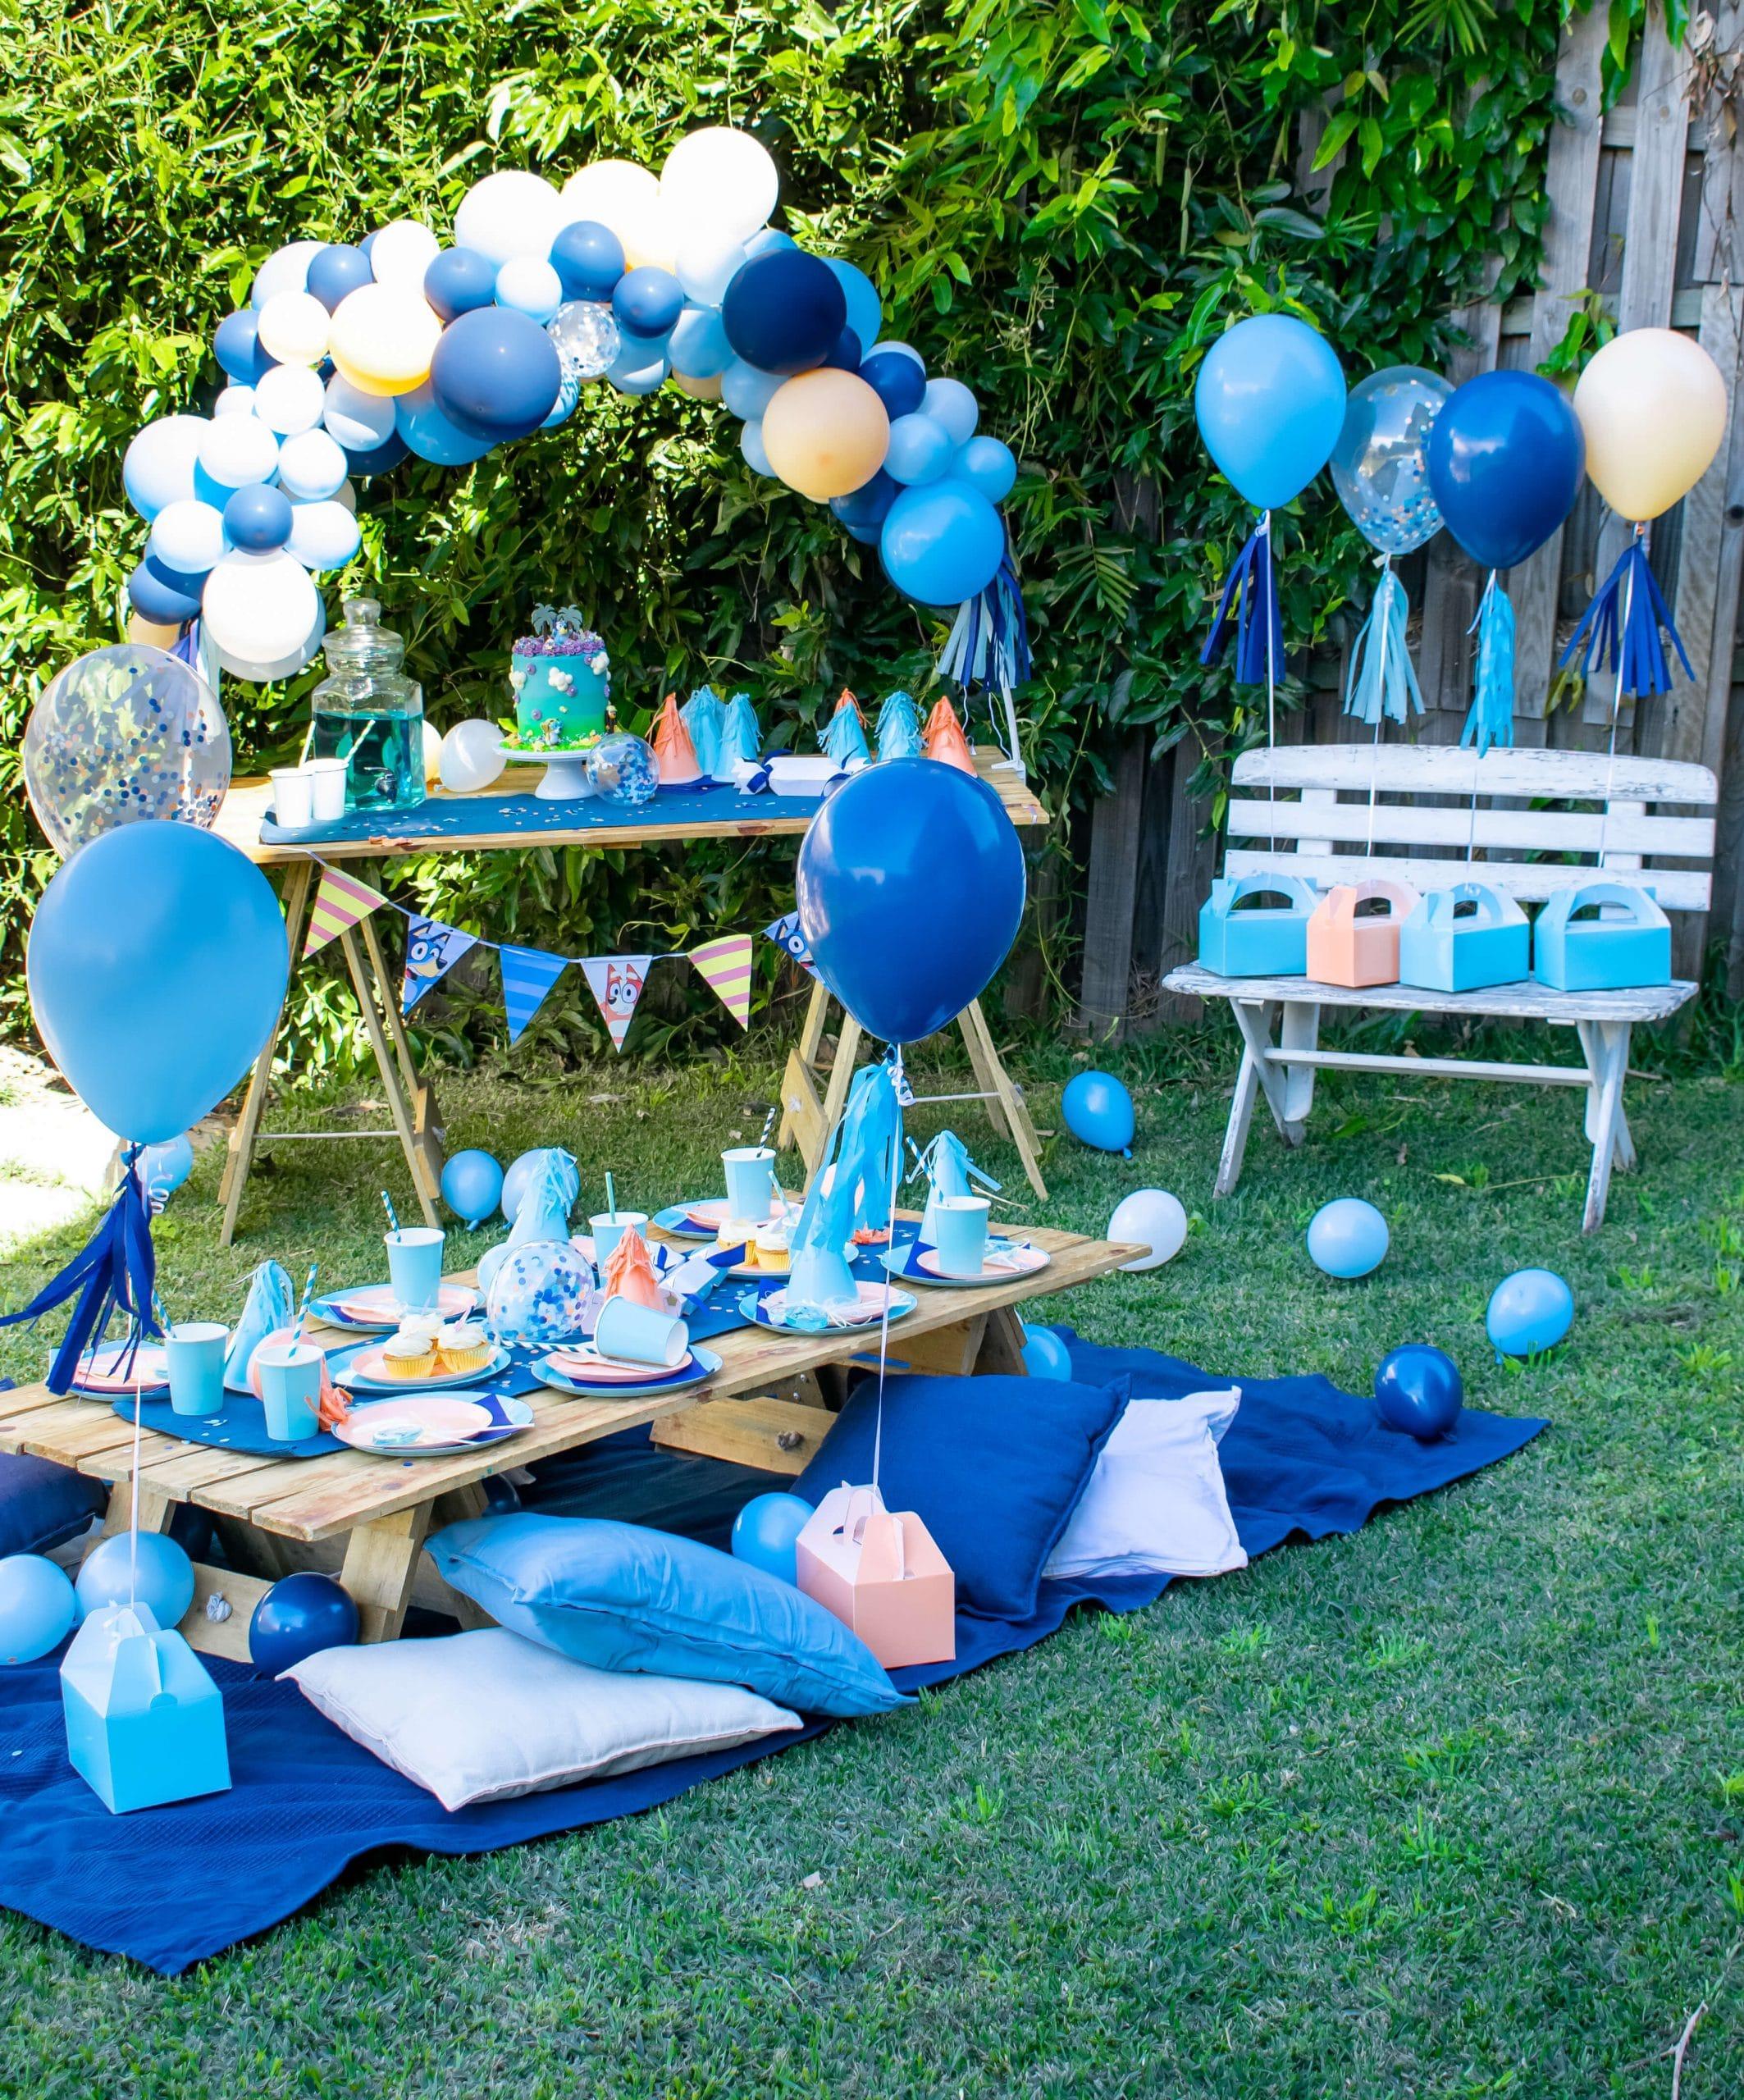 Bluey picnic party